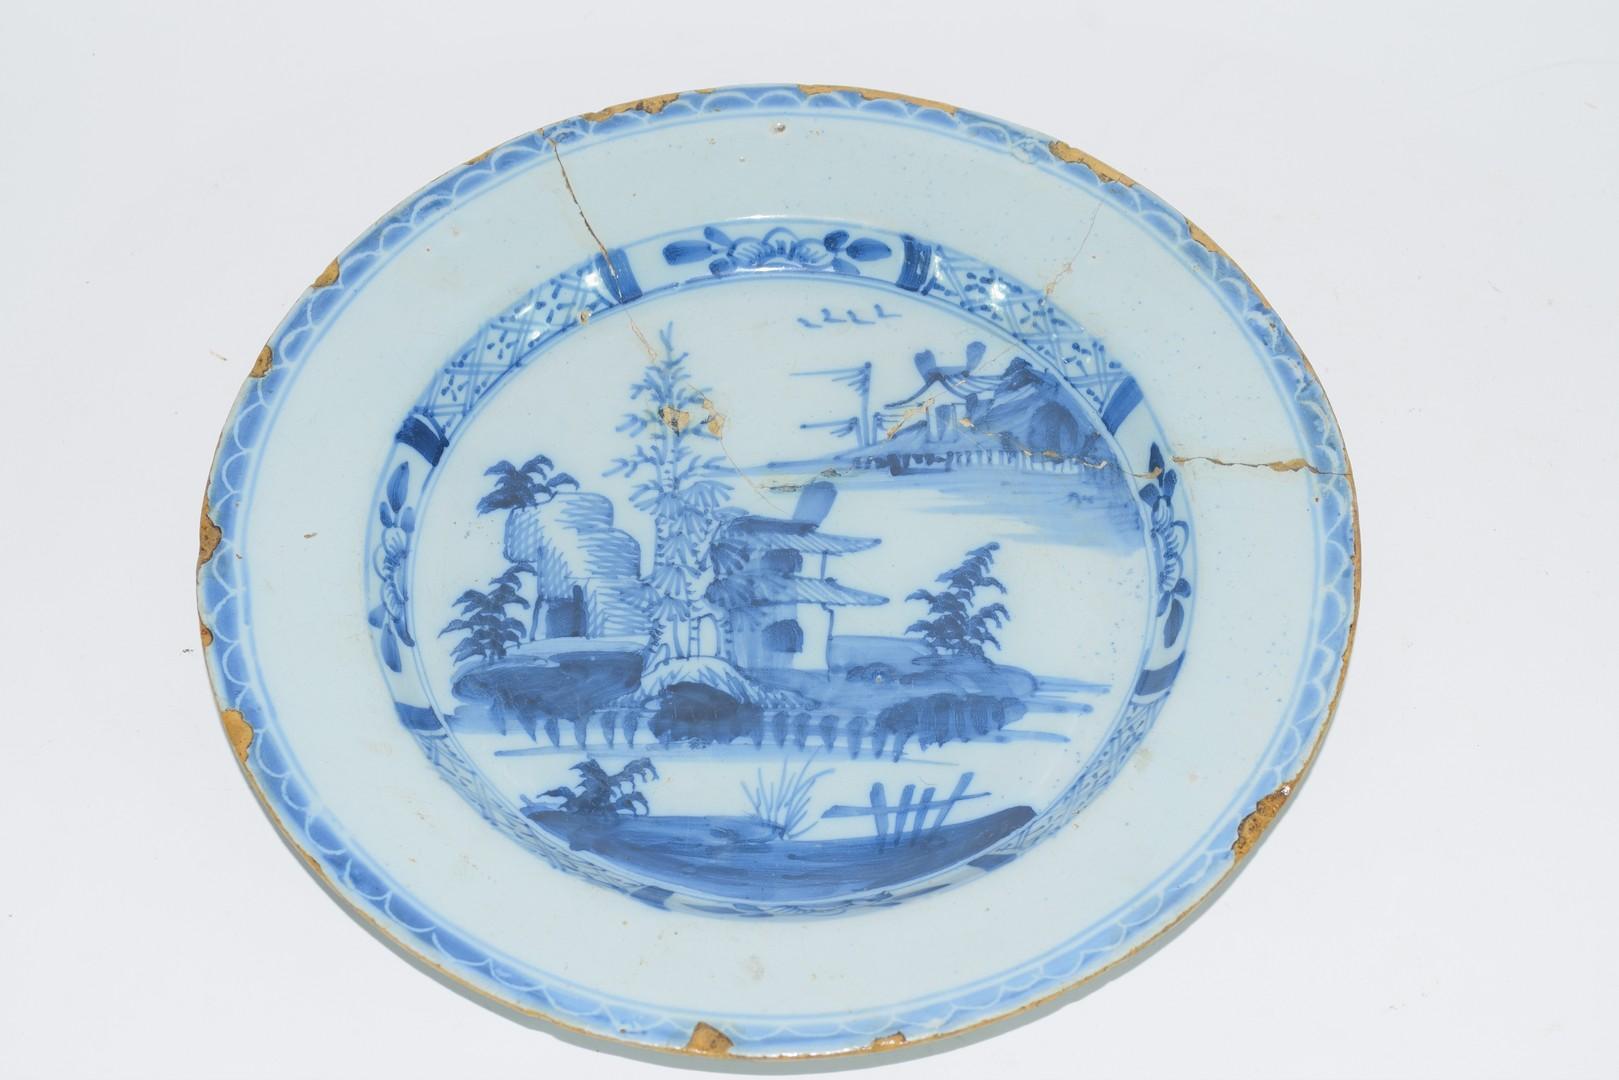 Three 18th century English Delft plates - Image 2 of 7